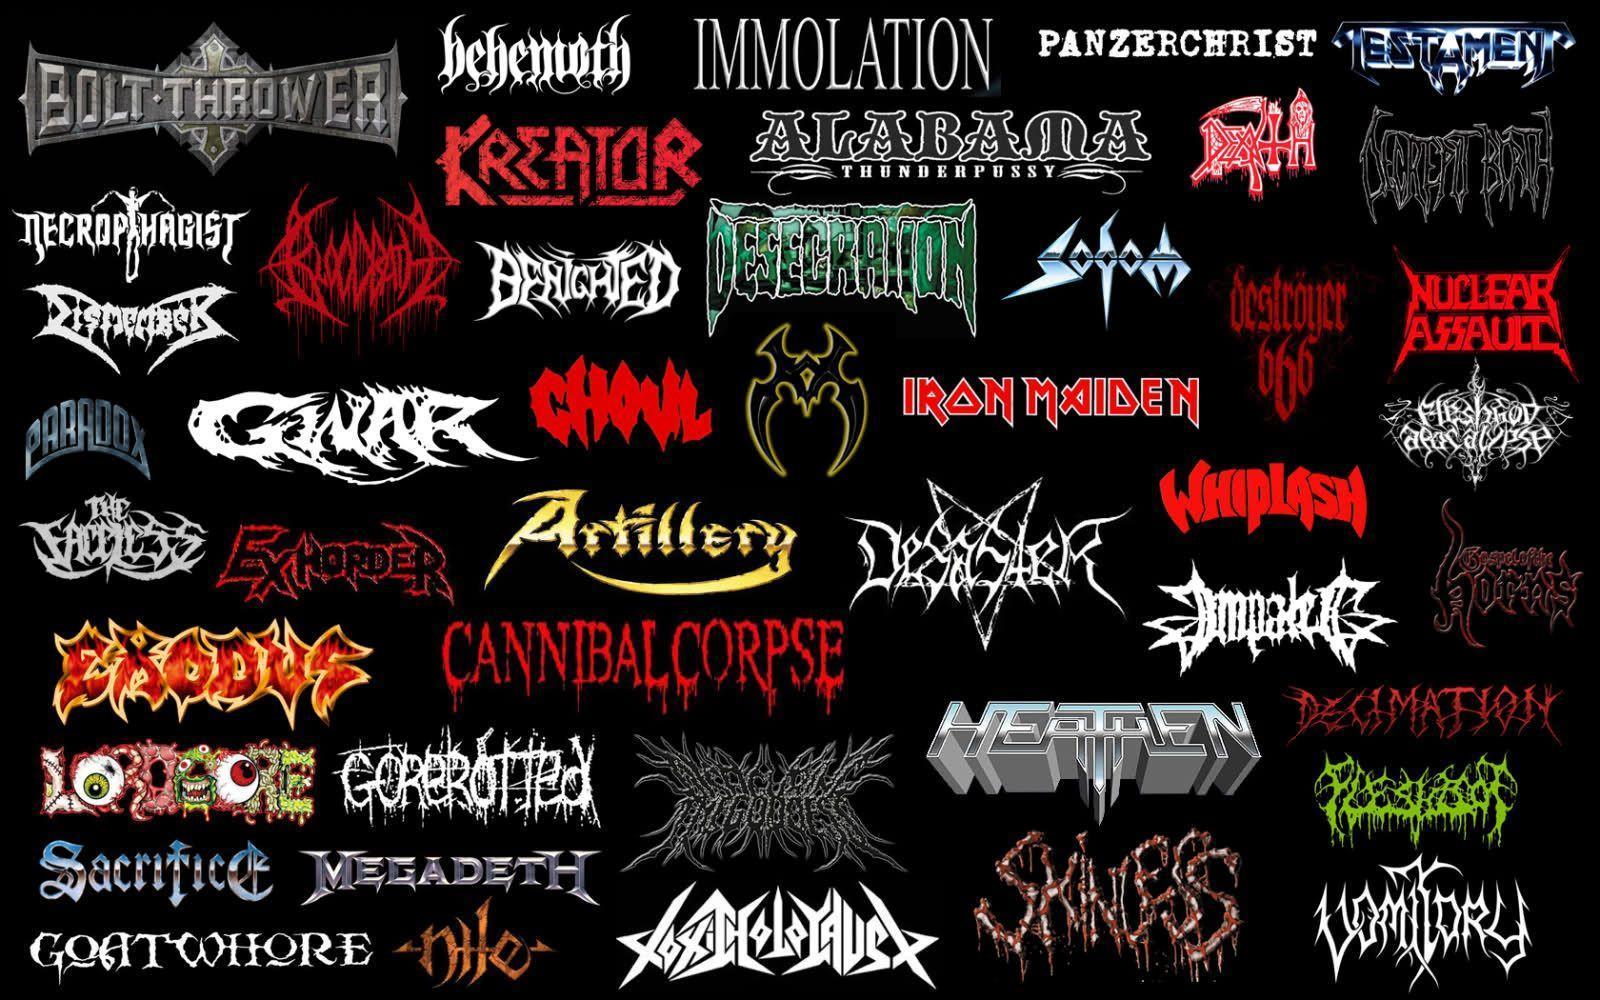 Attila Band Iphone Wallpaper Metal Bands Mit B 1500777 Hd Wallpaper Backgrounds Download